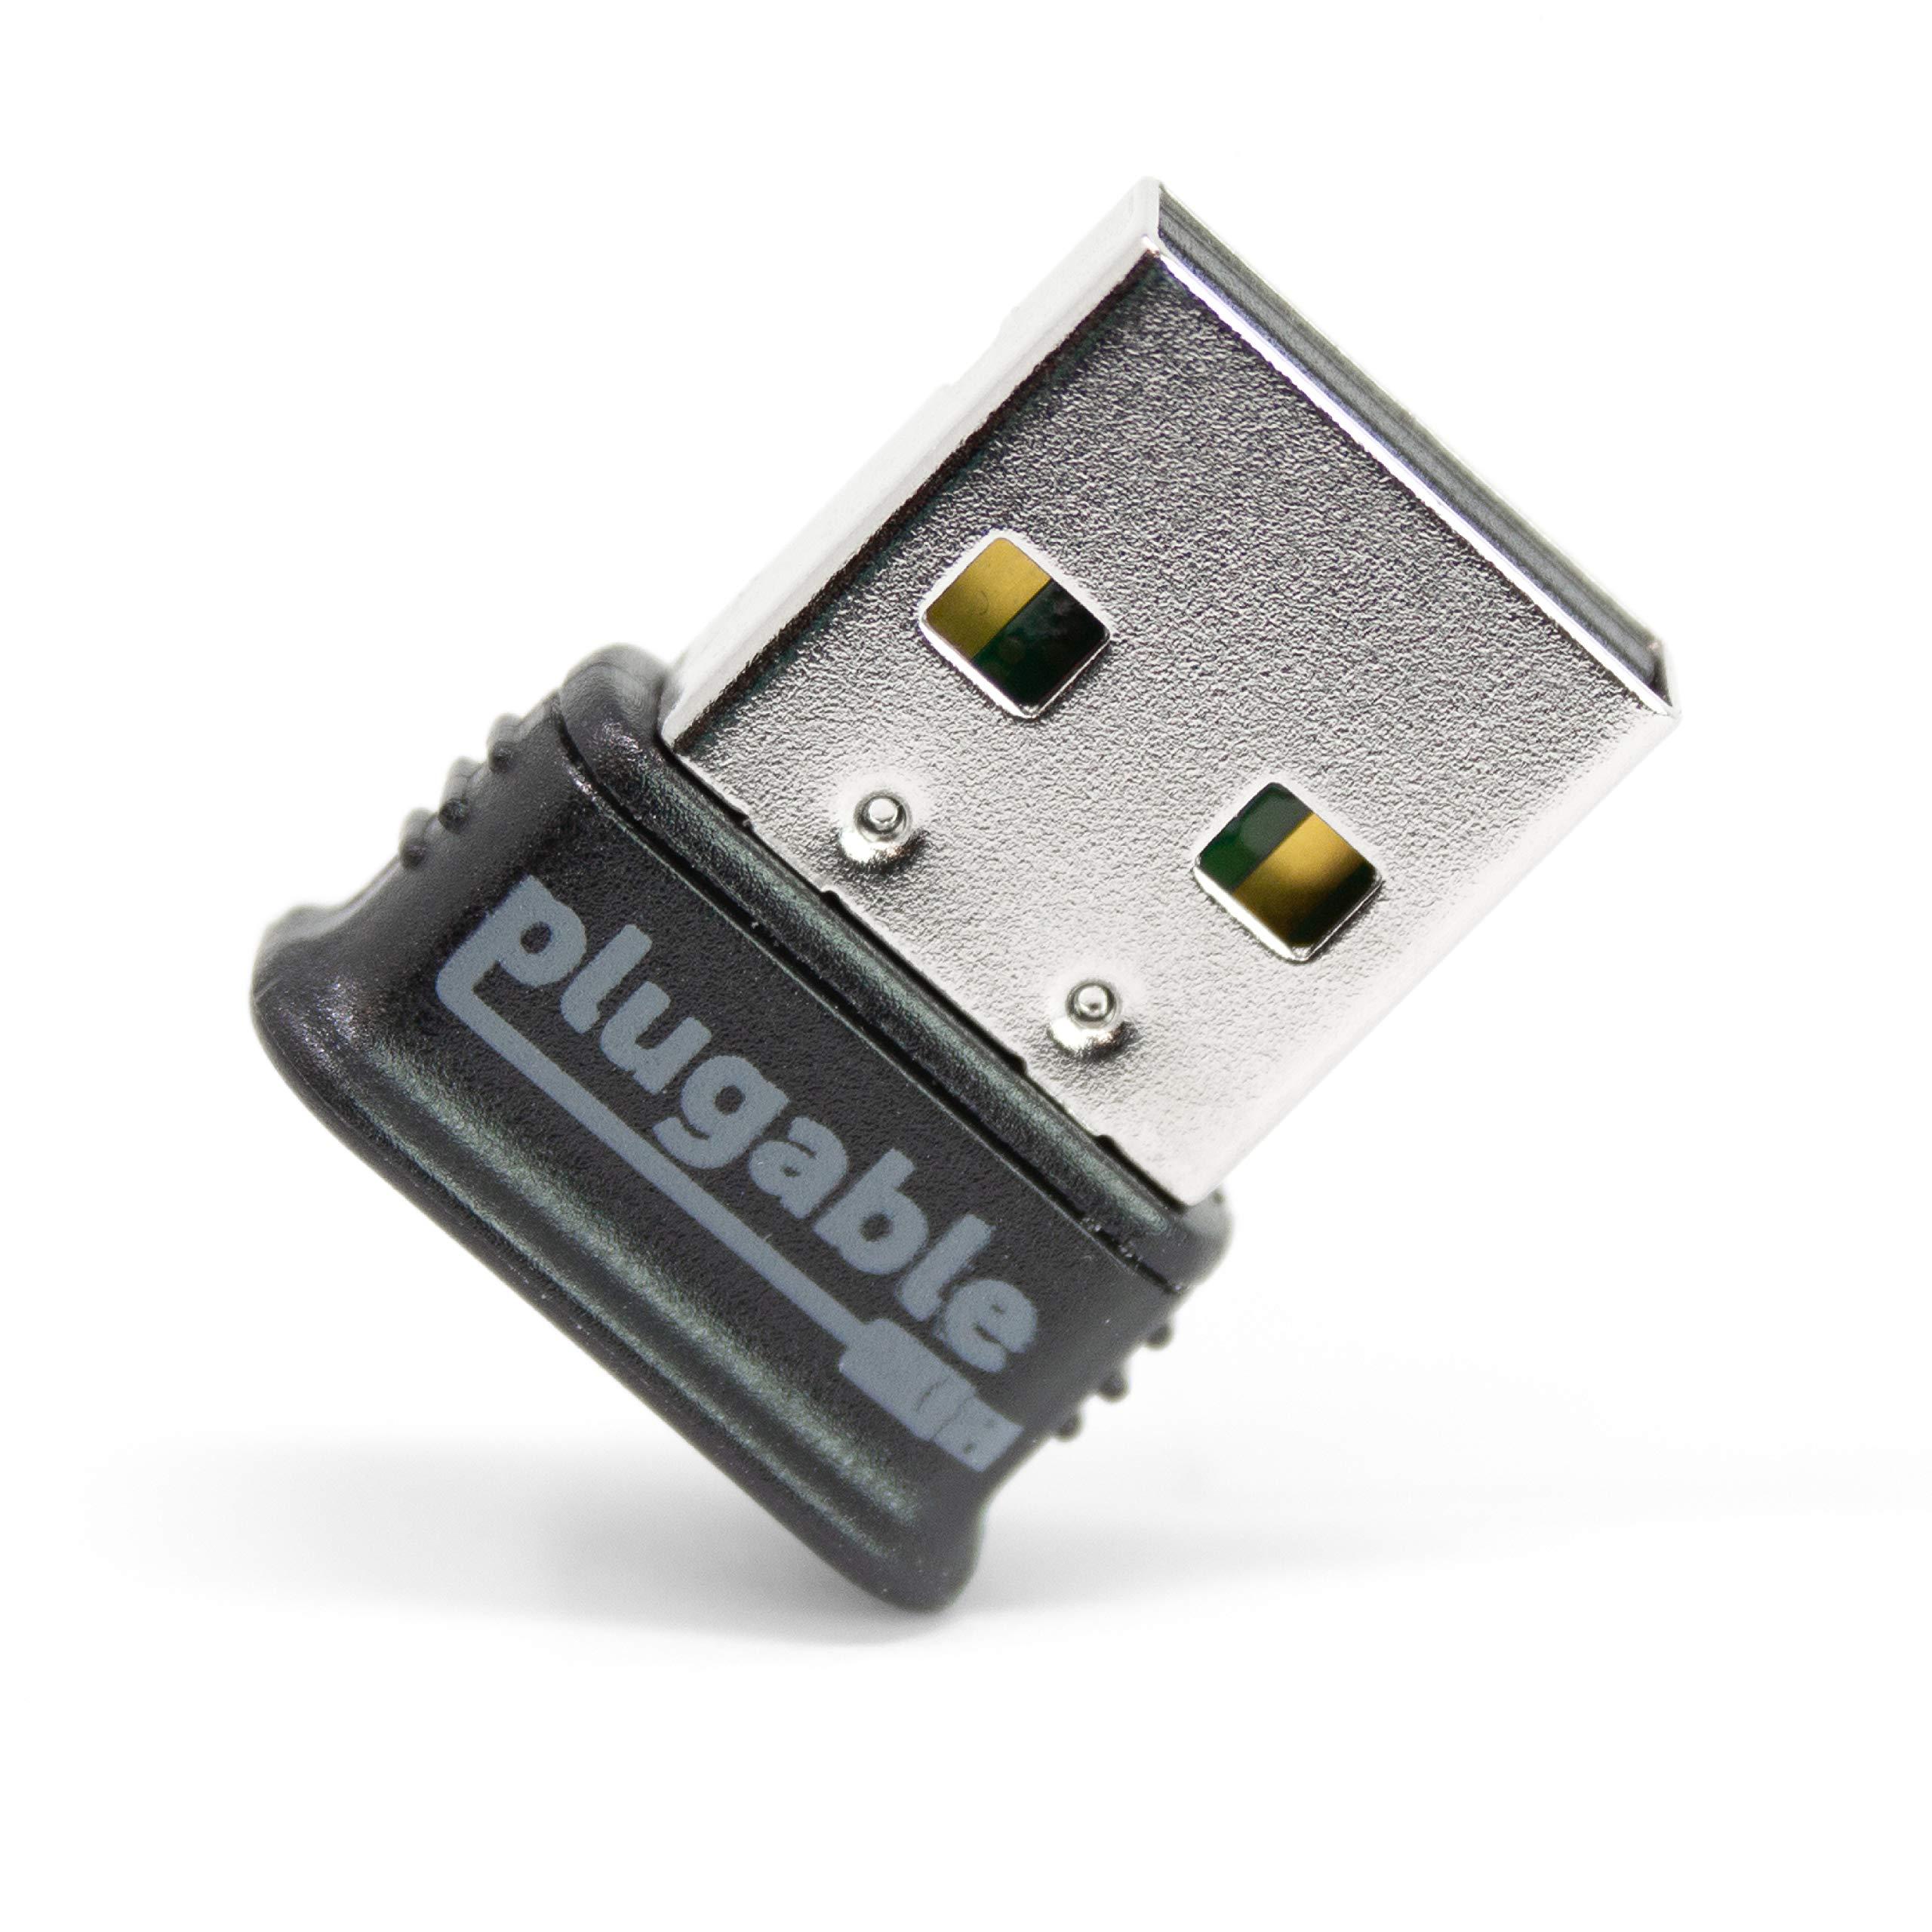 Bluetooth Adapter For Samsung TV: Amazon.com